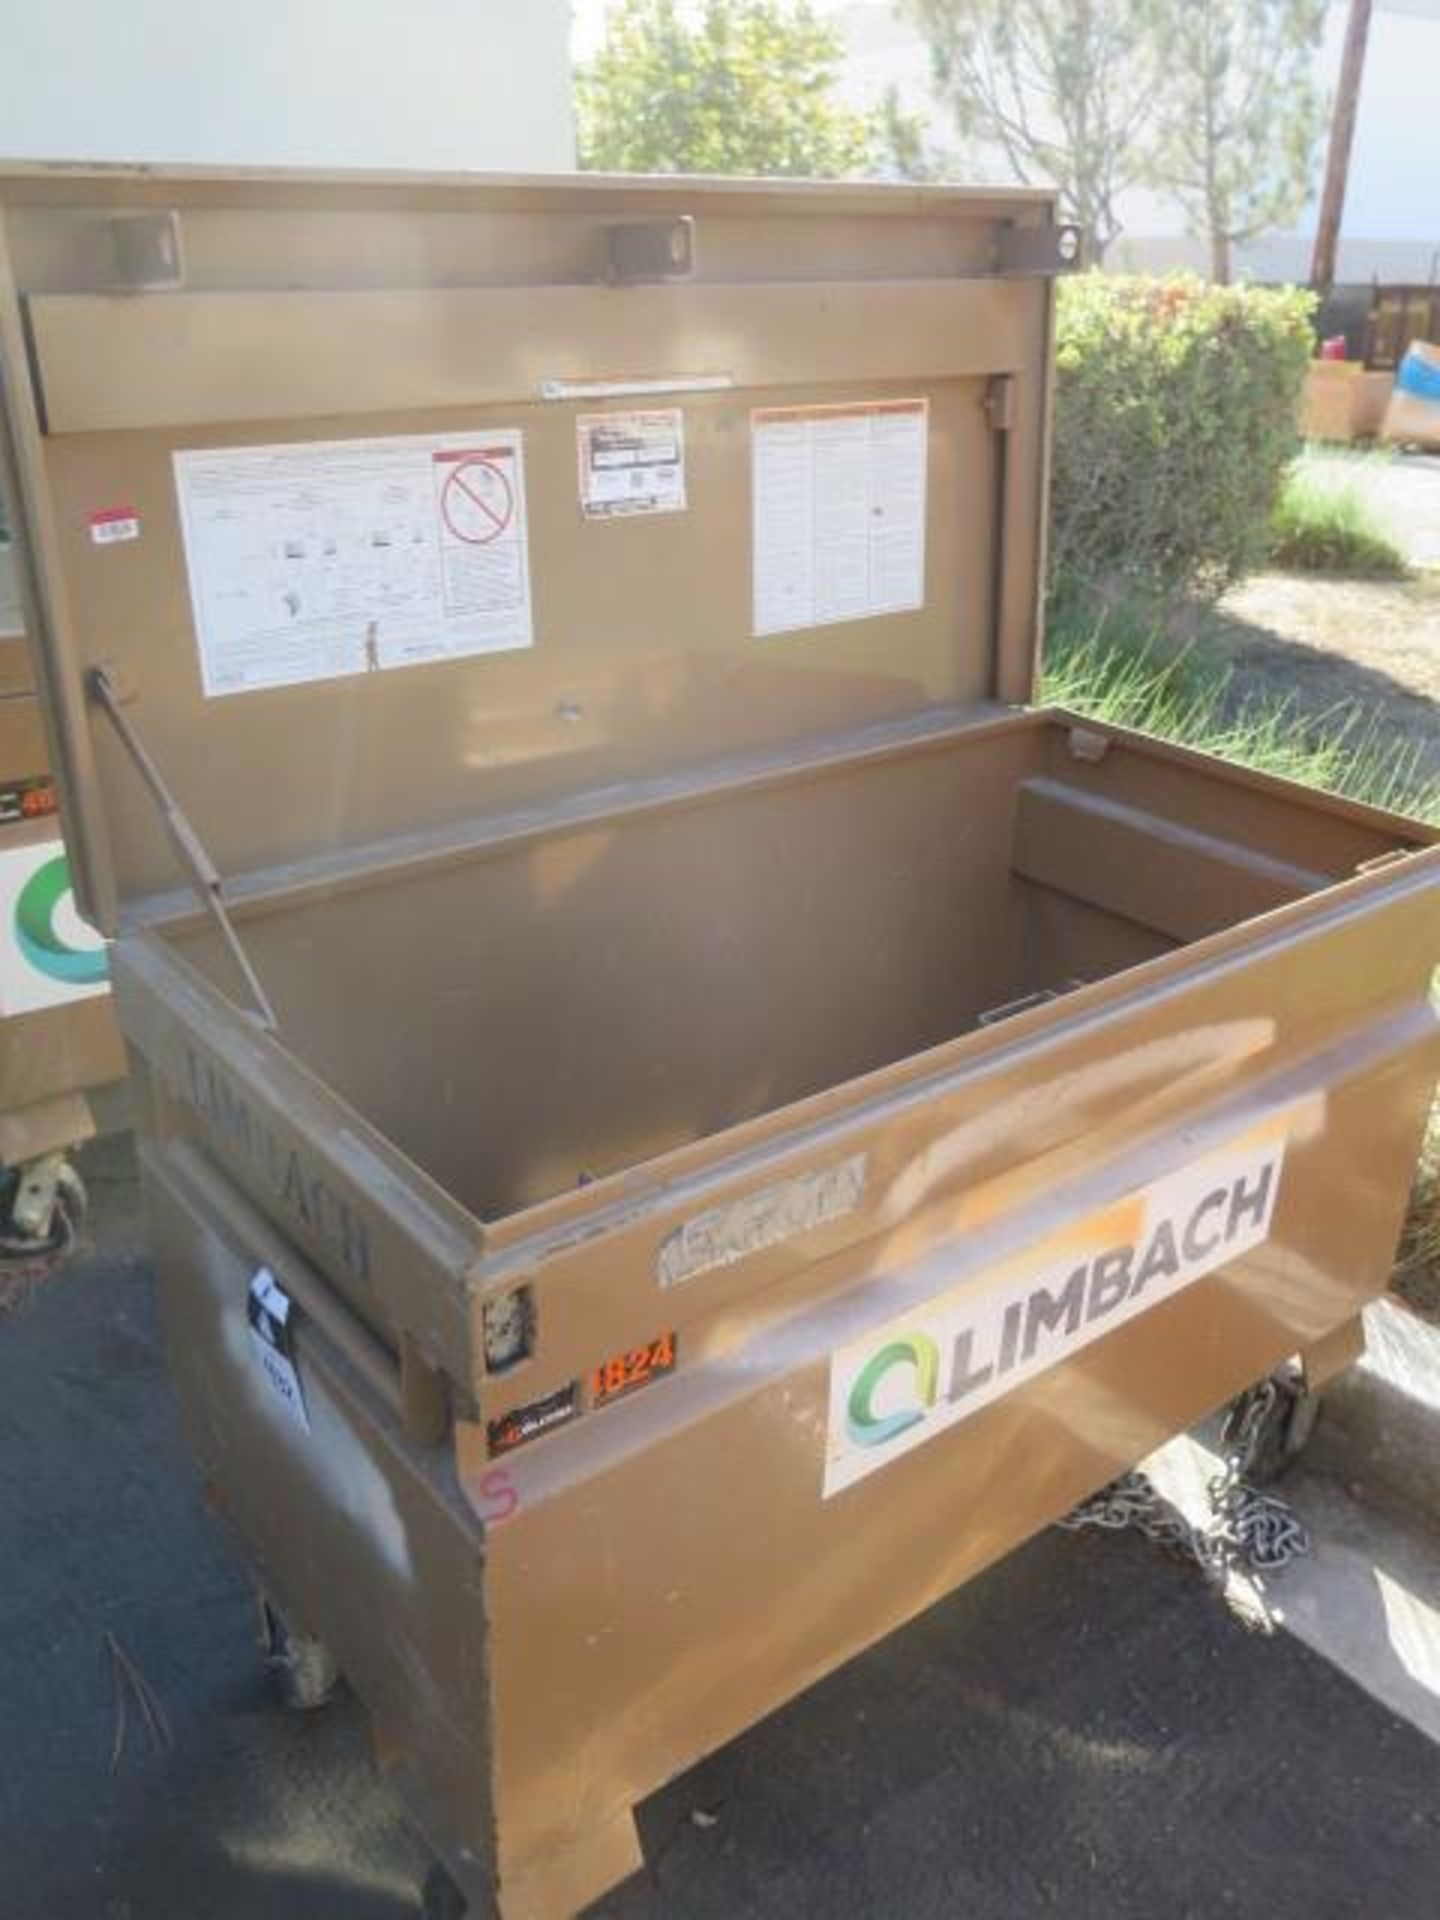 Knaack mdl. 4824 Rolling Job Box (SOLD AS-IS - NO WARRANTY) - Image 4 of 7